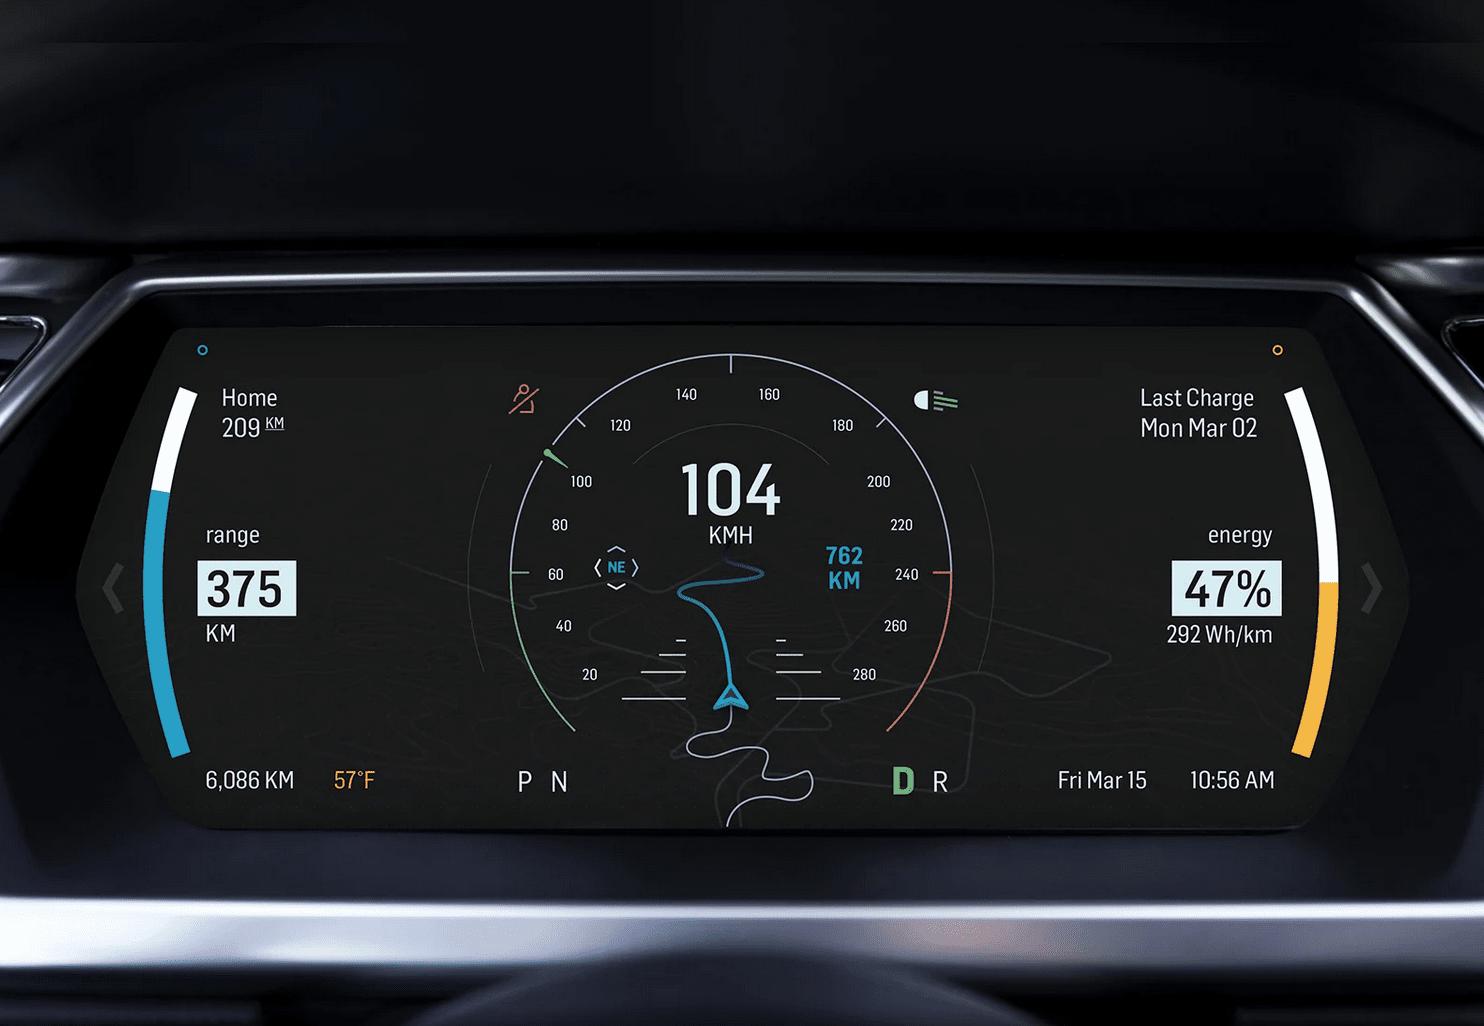 ev, car, dashboard, concept